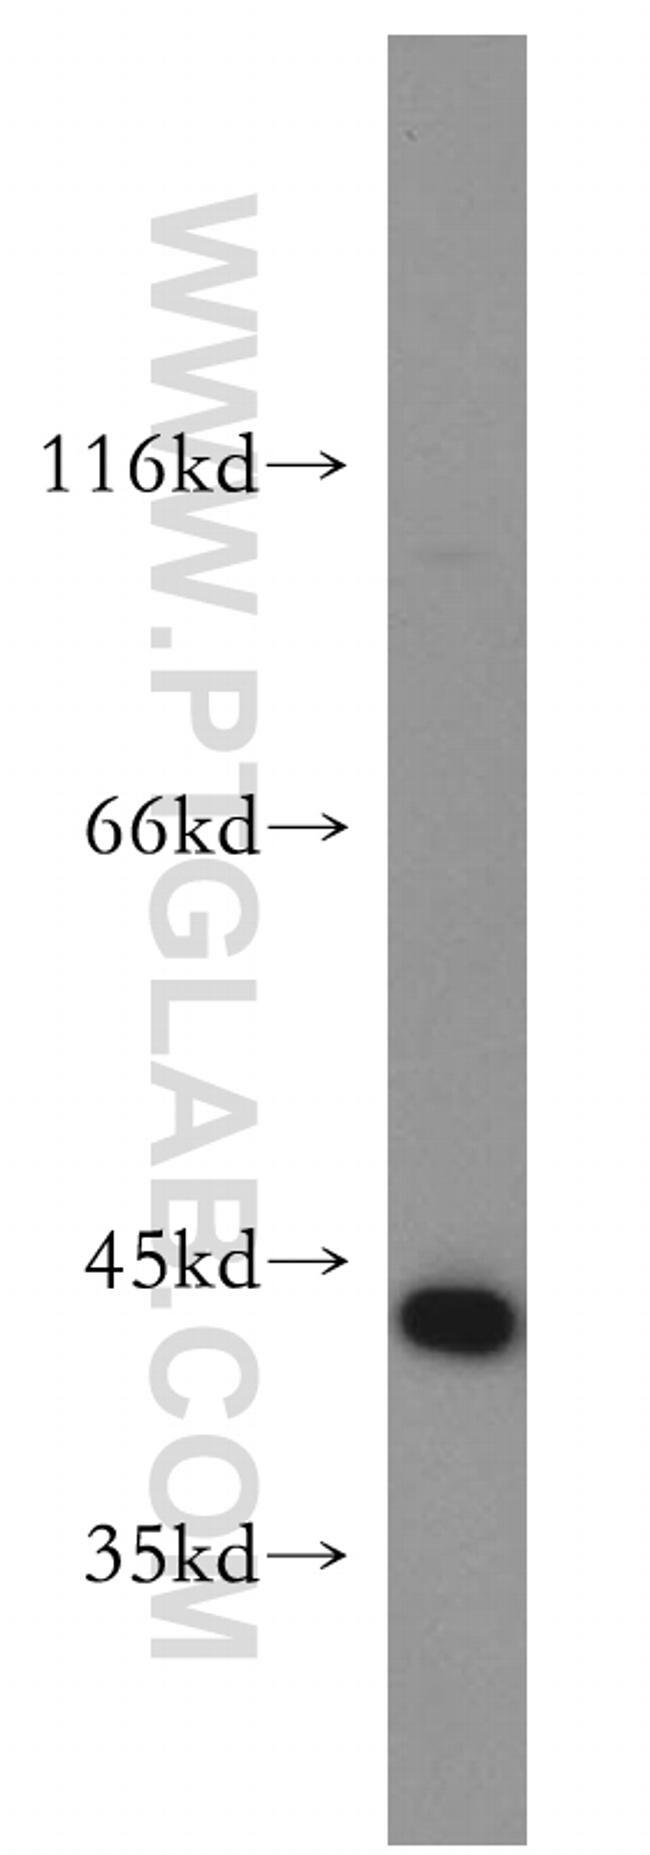 Maspin Antibody in Western Blot (WB)